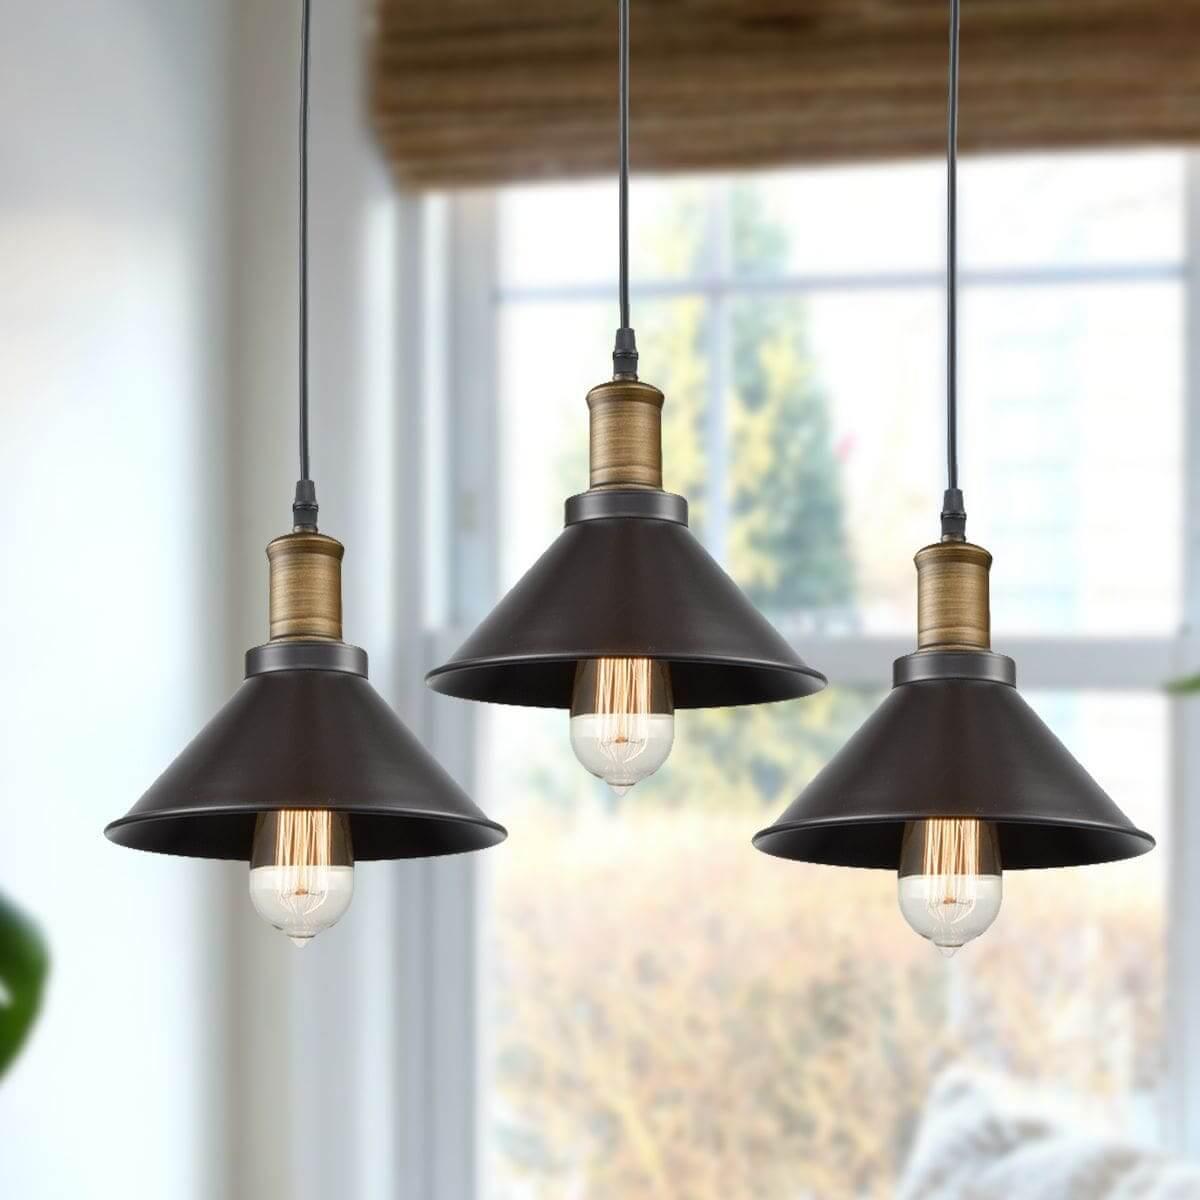 Oil Rubbed Bronze Industrial Pendant Lighting 3 Pack Mini Pendant Lights